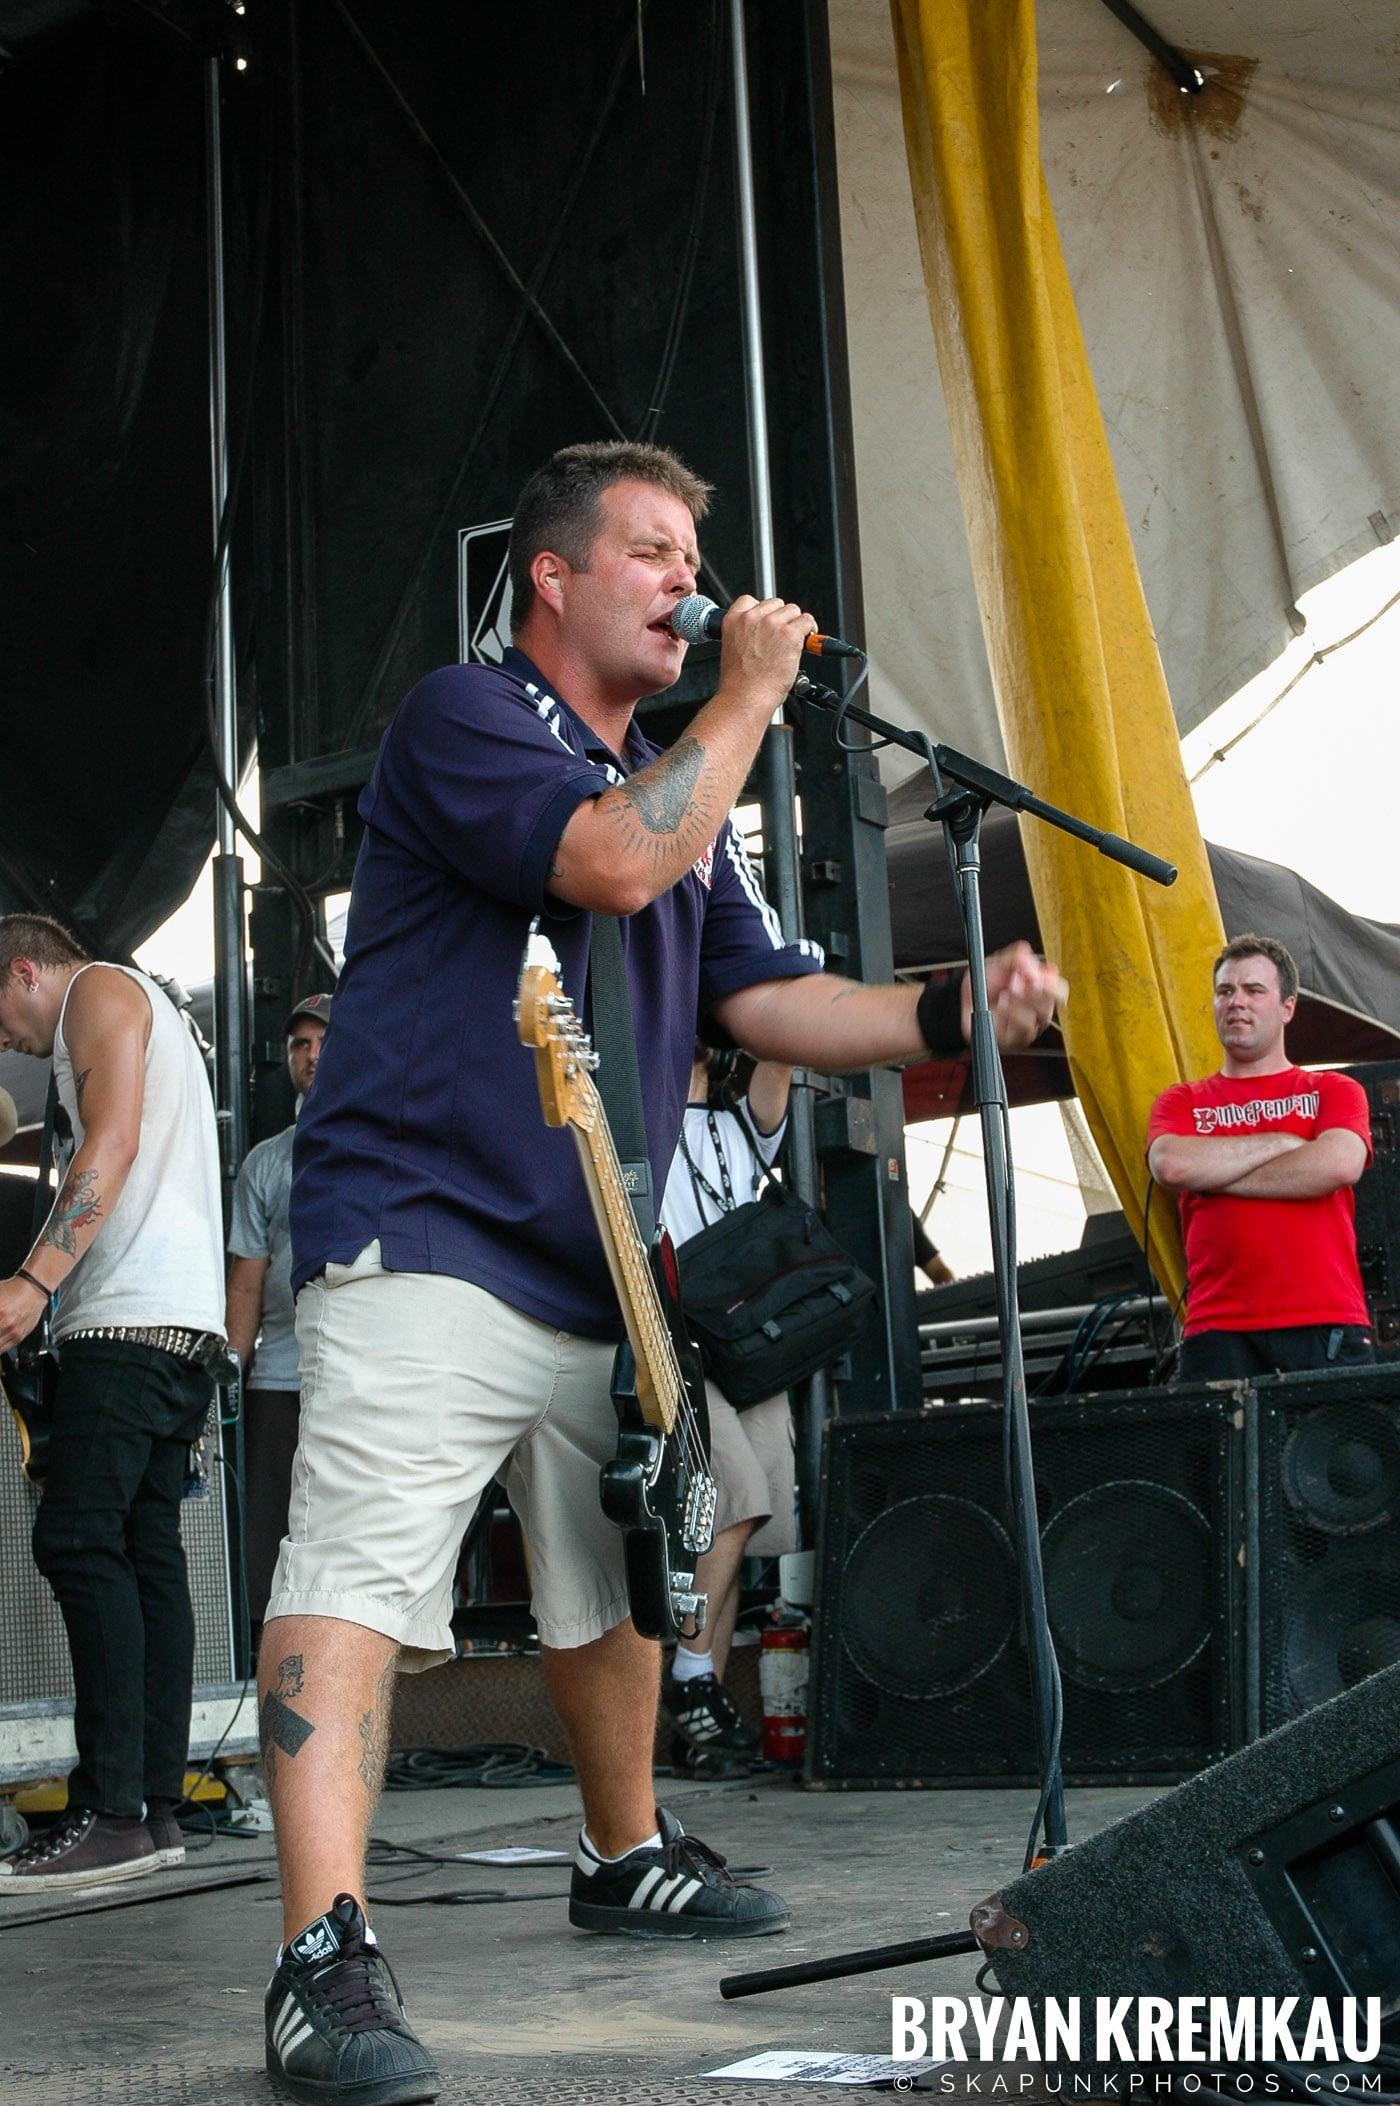 Dropkick Murphys @ Warped Tour 05, NYC - 8.12.05 (7)